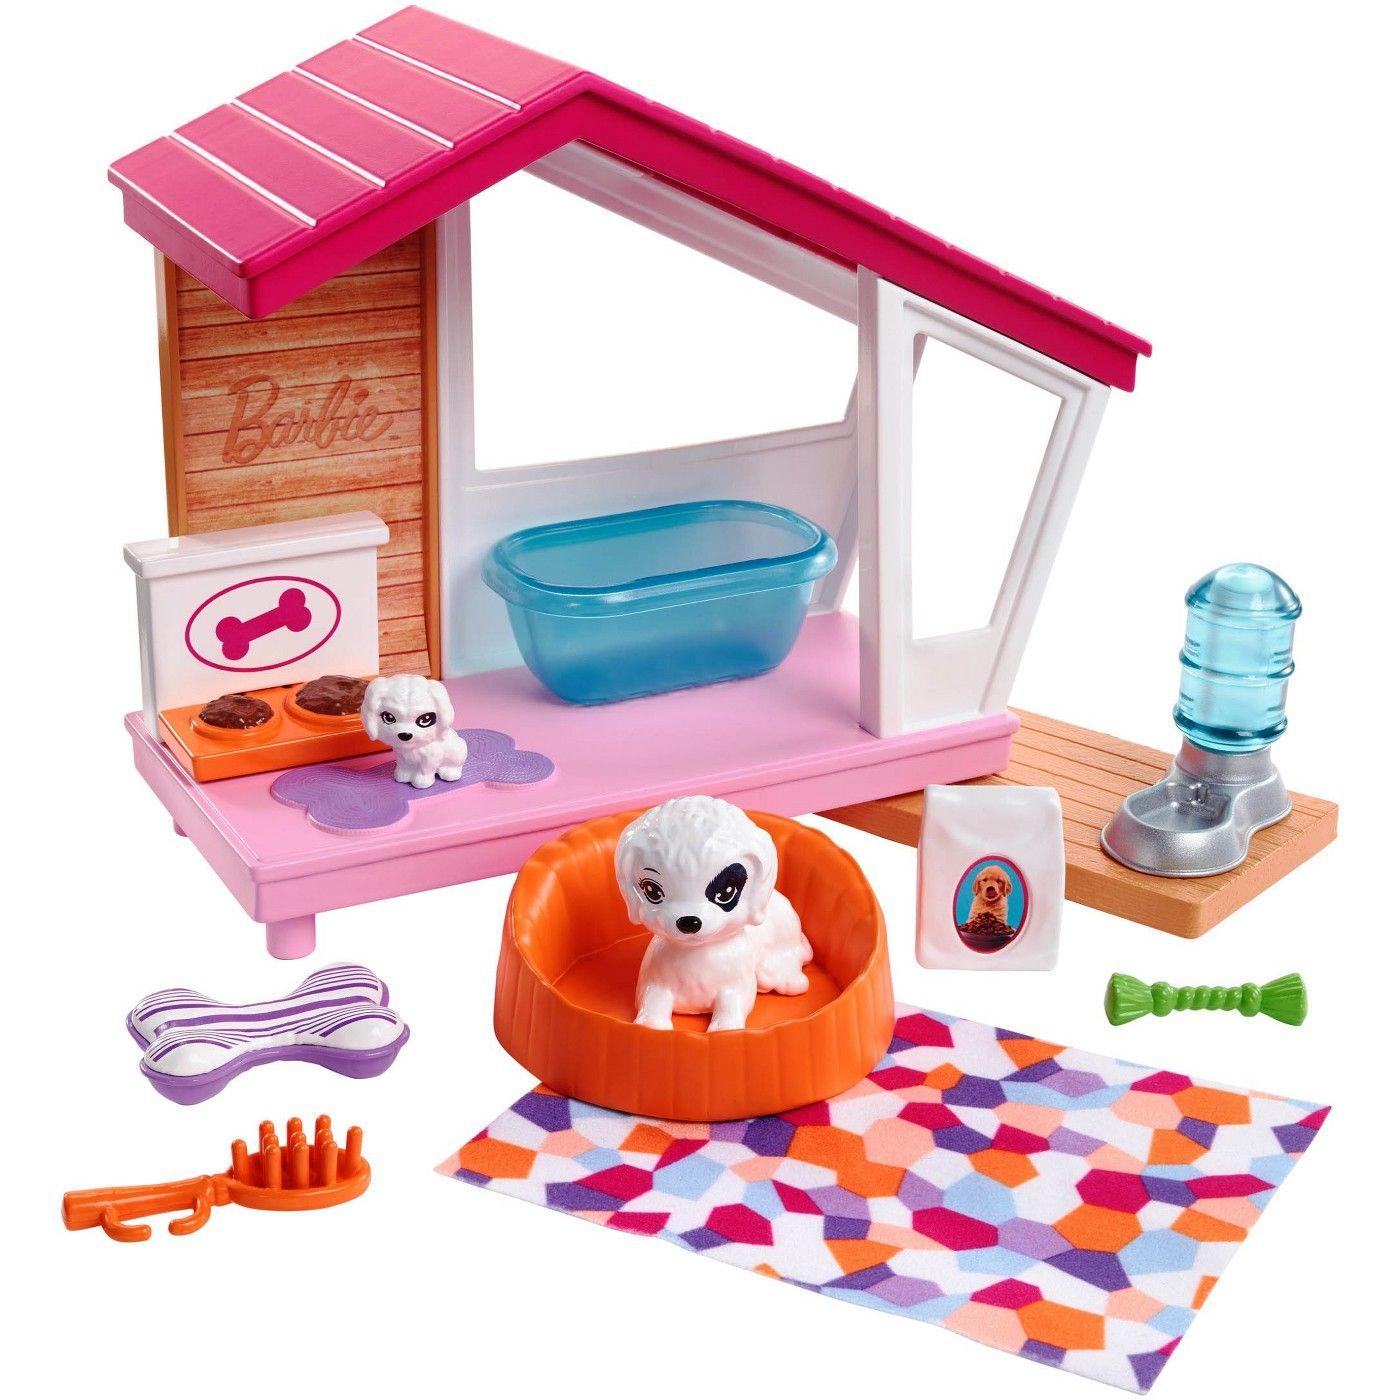 Barbie Dog House Playset Affiliate Dog, ad, Barbie,